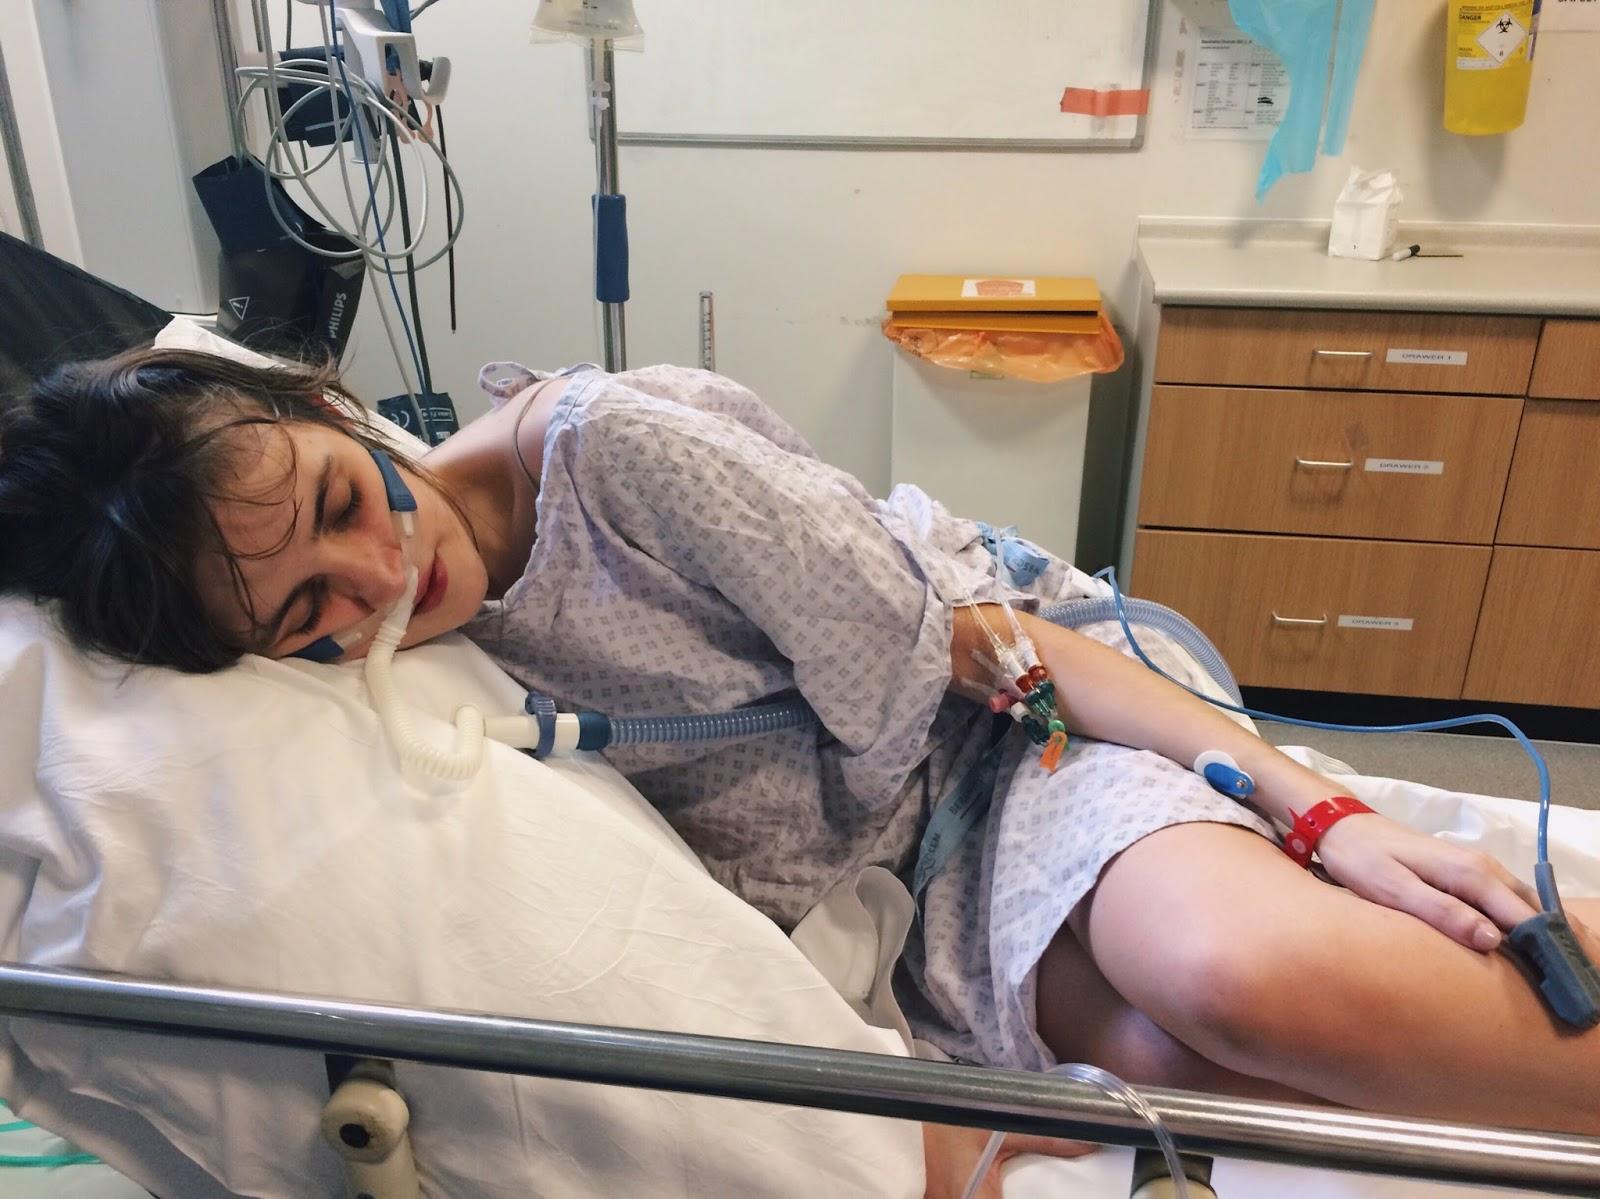 cystic fibrosis lung transplant, cystic fibrosis ecmo, ecmo lung transplant